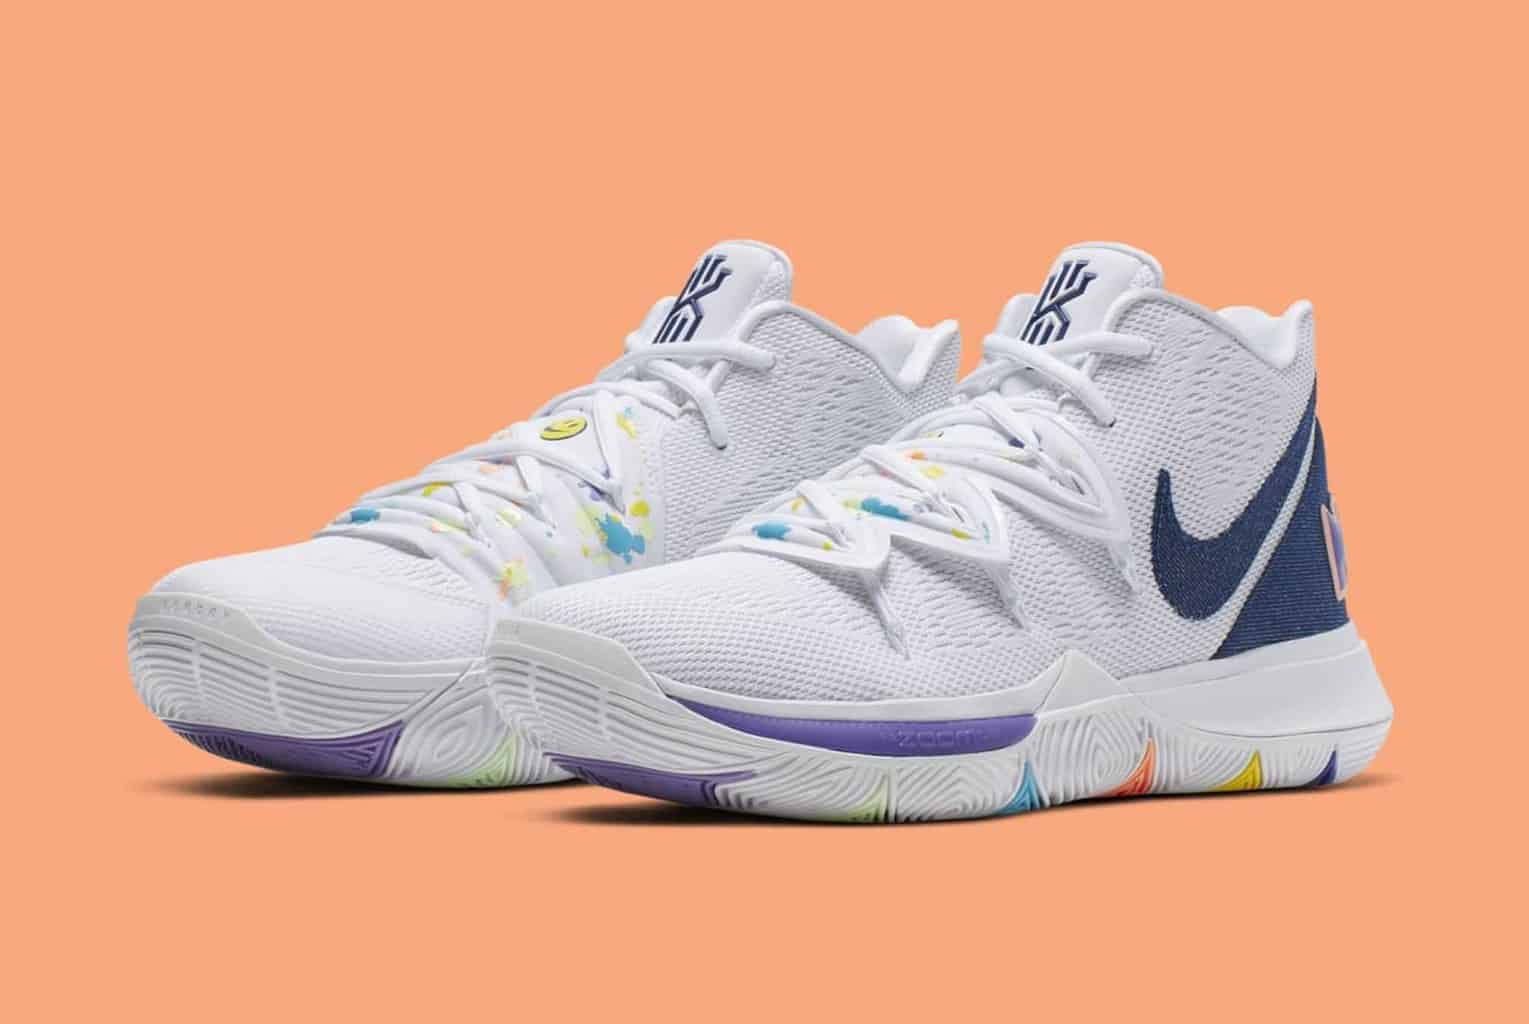 Nike \u0026 Kyrie Irving Just Released